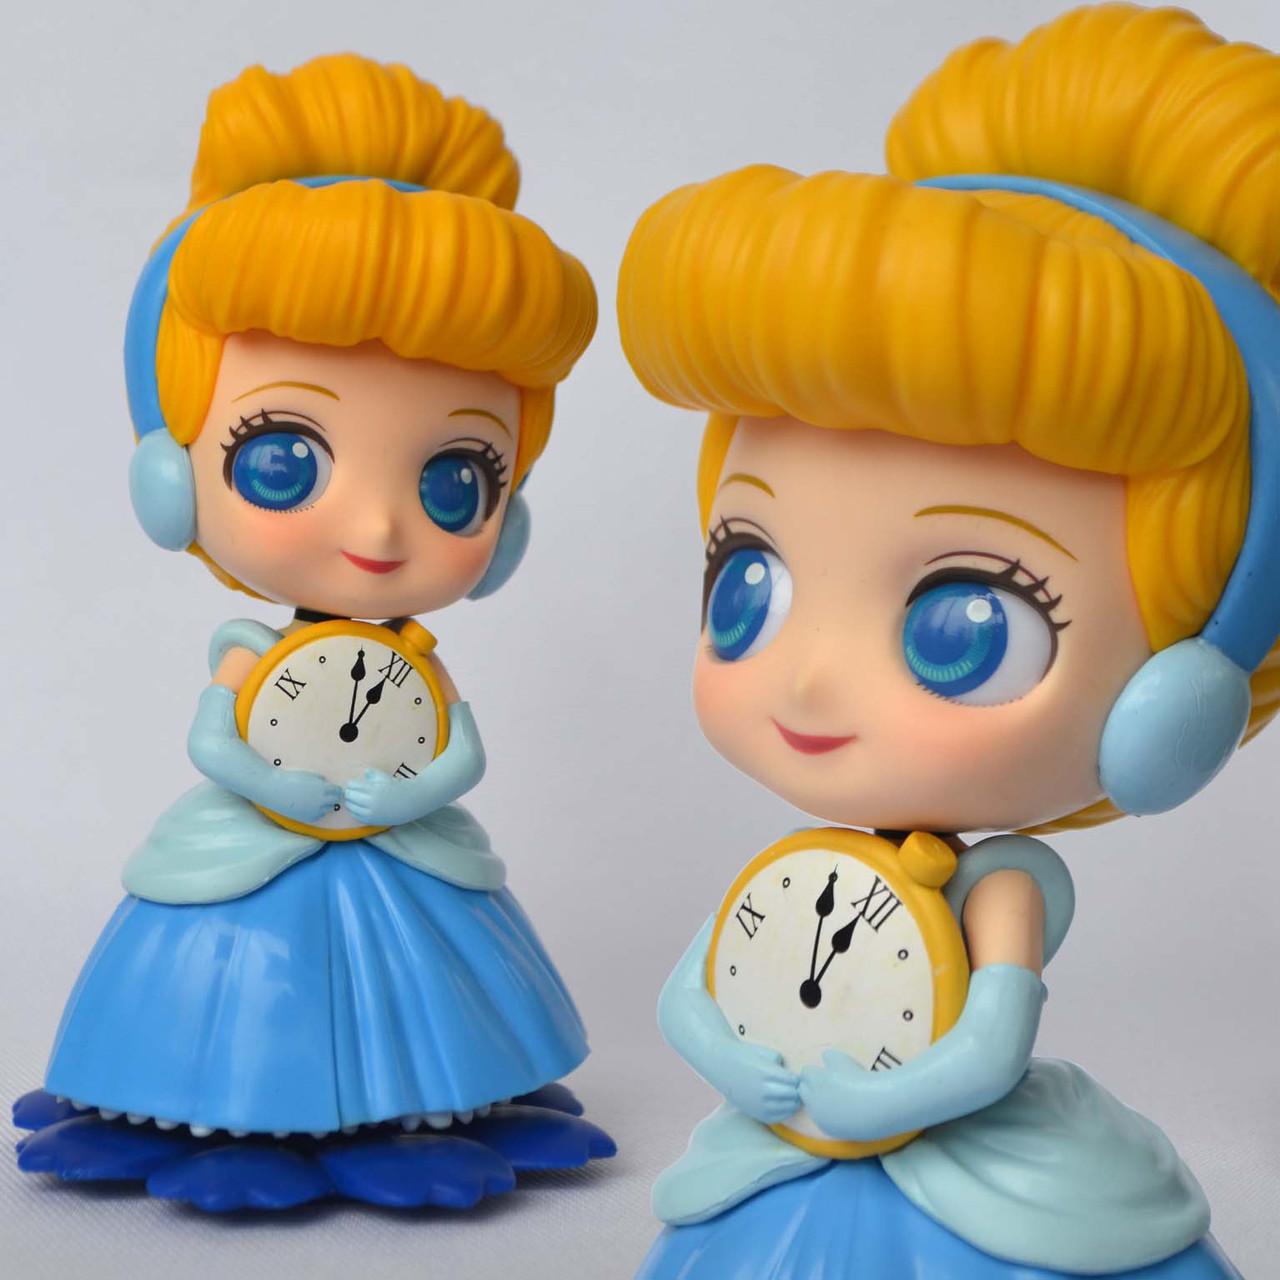 Аніме-фігурка Sweetiny Disney Characters Cinderella